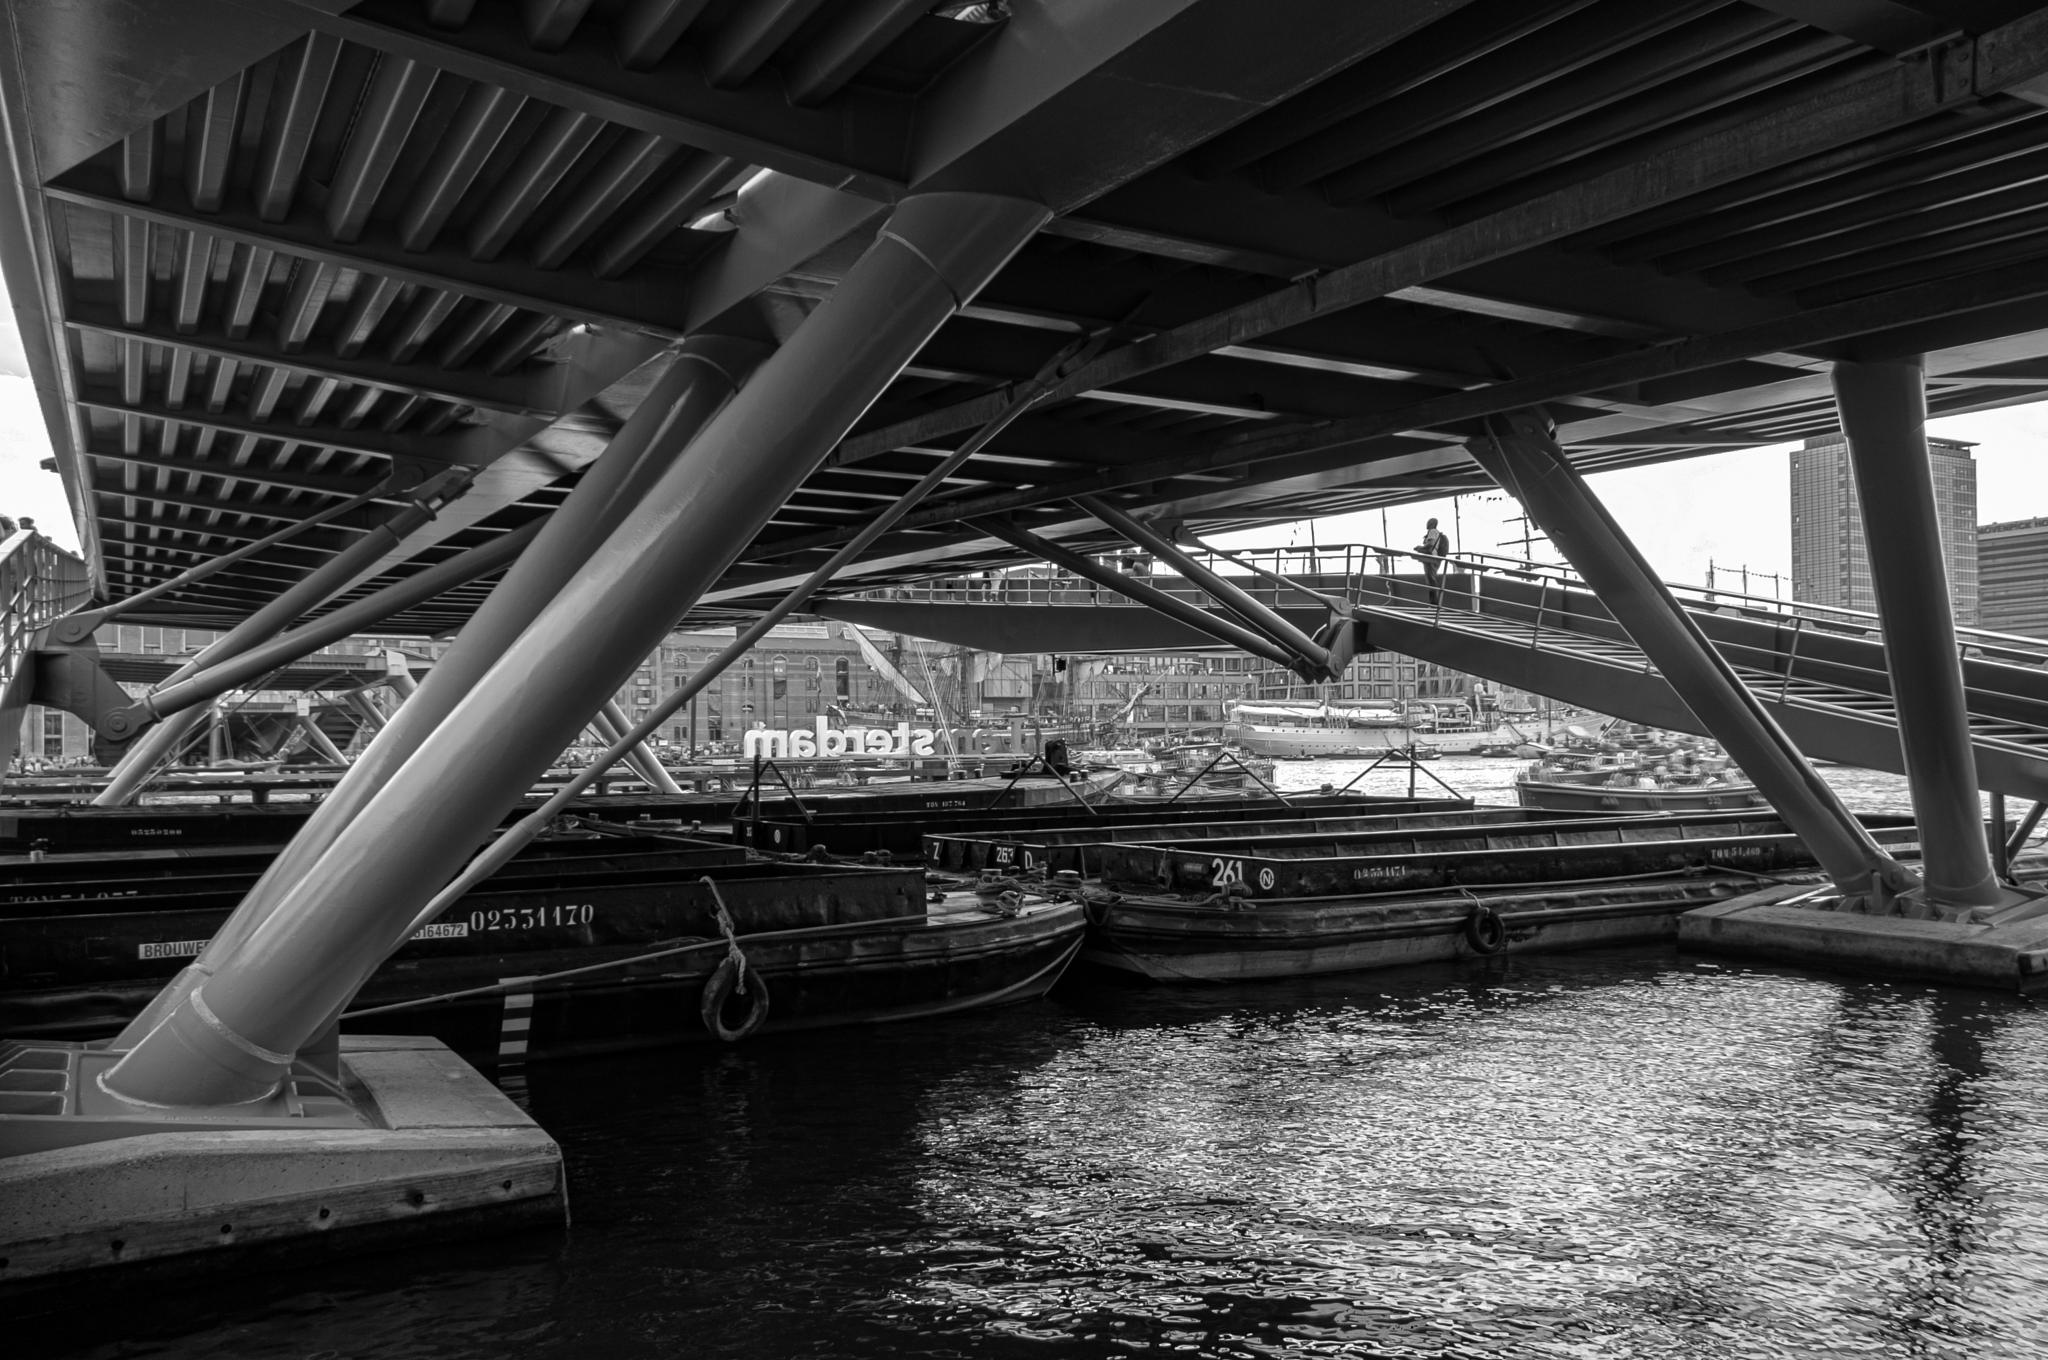 Under the bridge by Vogala